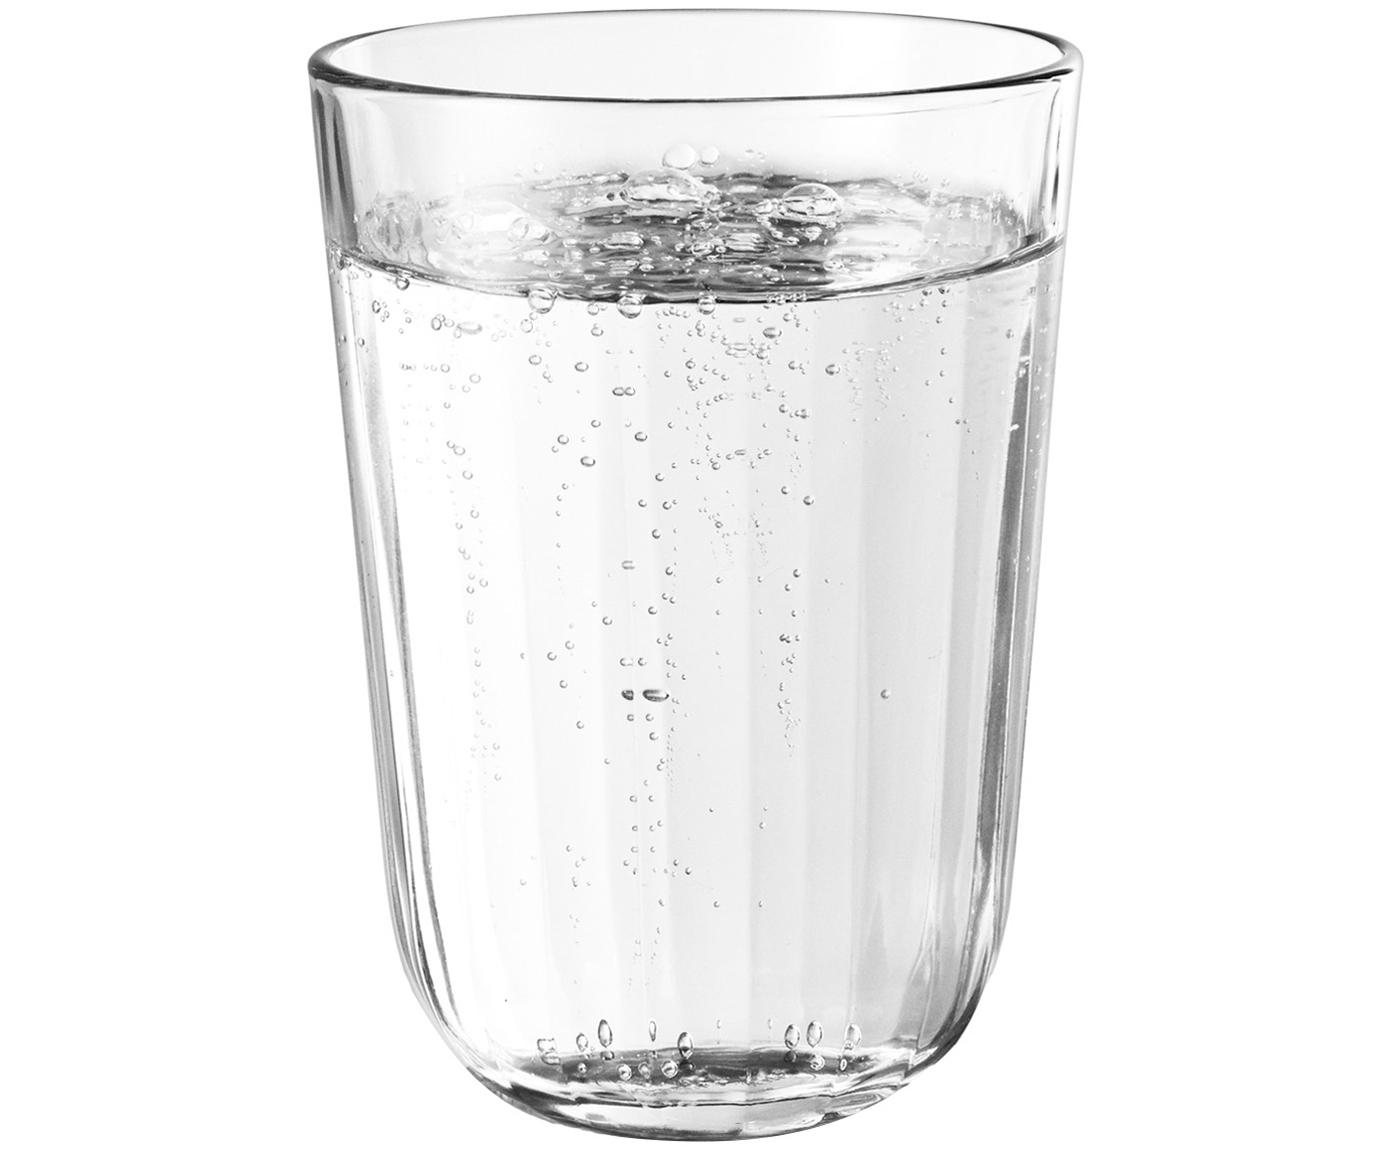 Waterglazen Facette, 4 stuks, Glas, Transparant, 340 ml